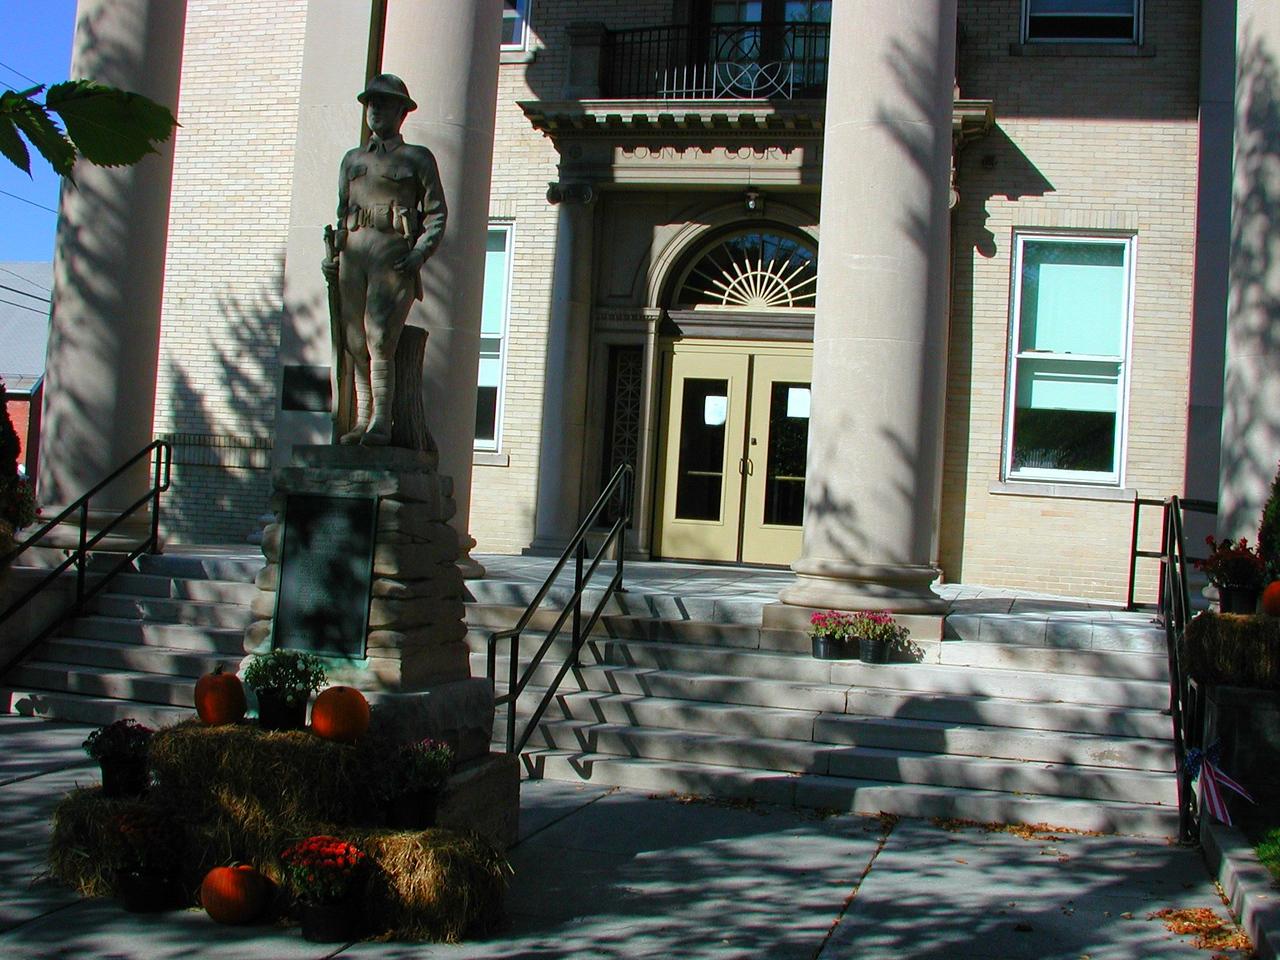 Front door to Romney, WVA courthouse.